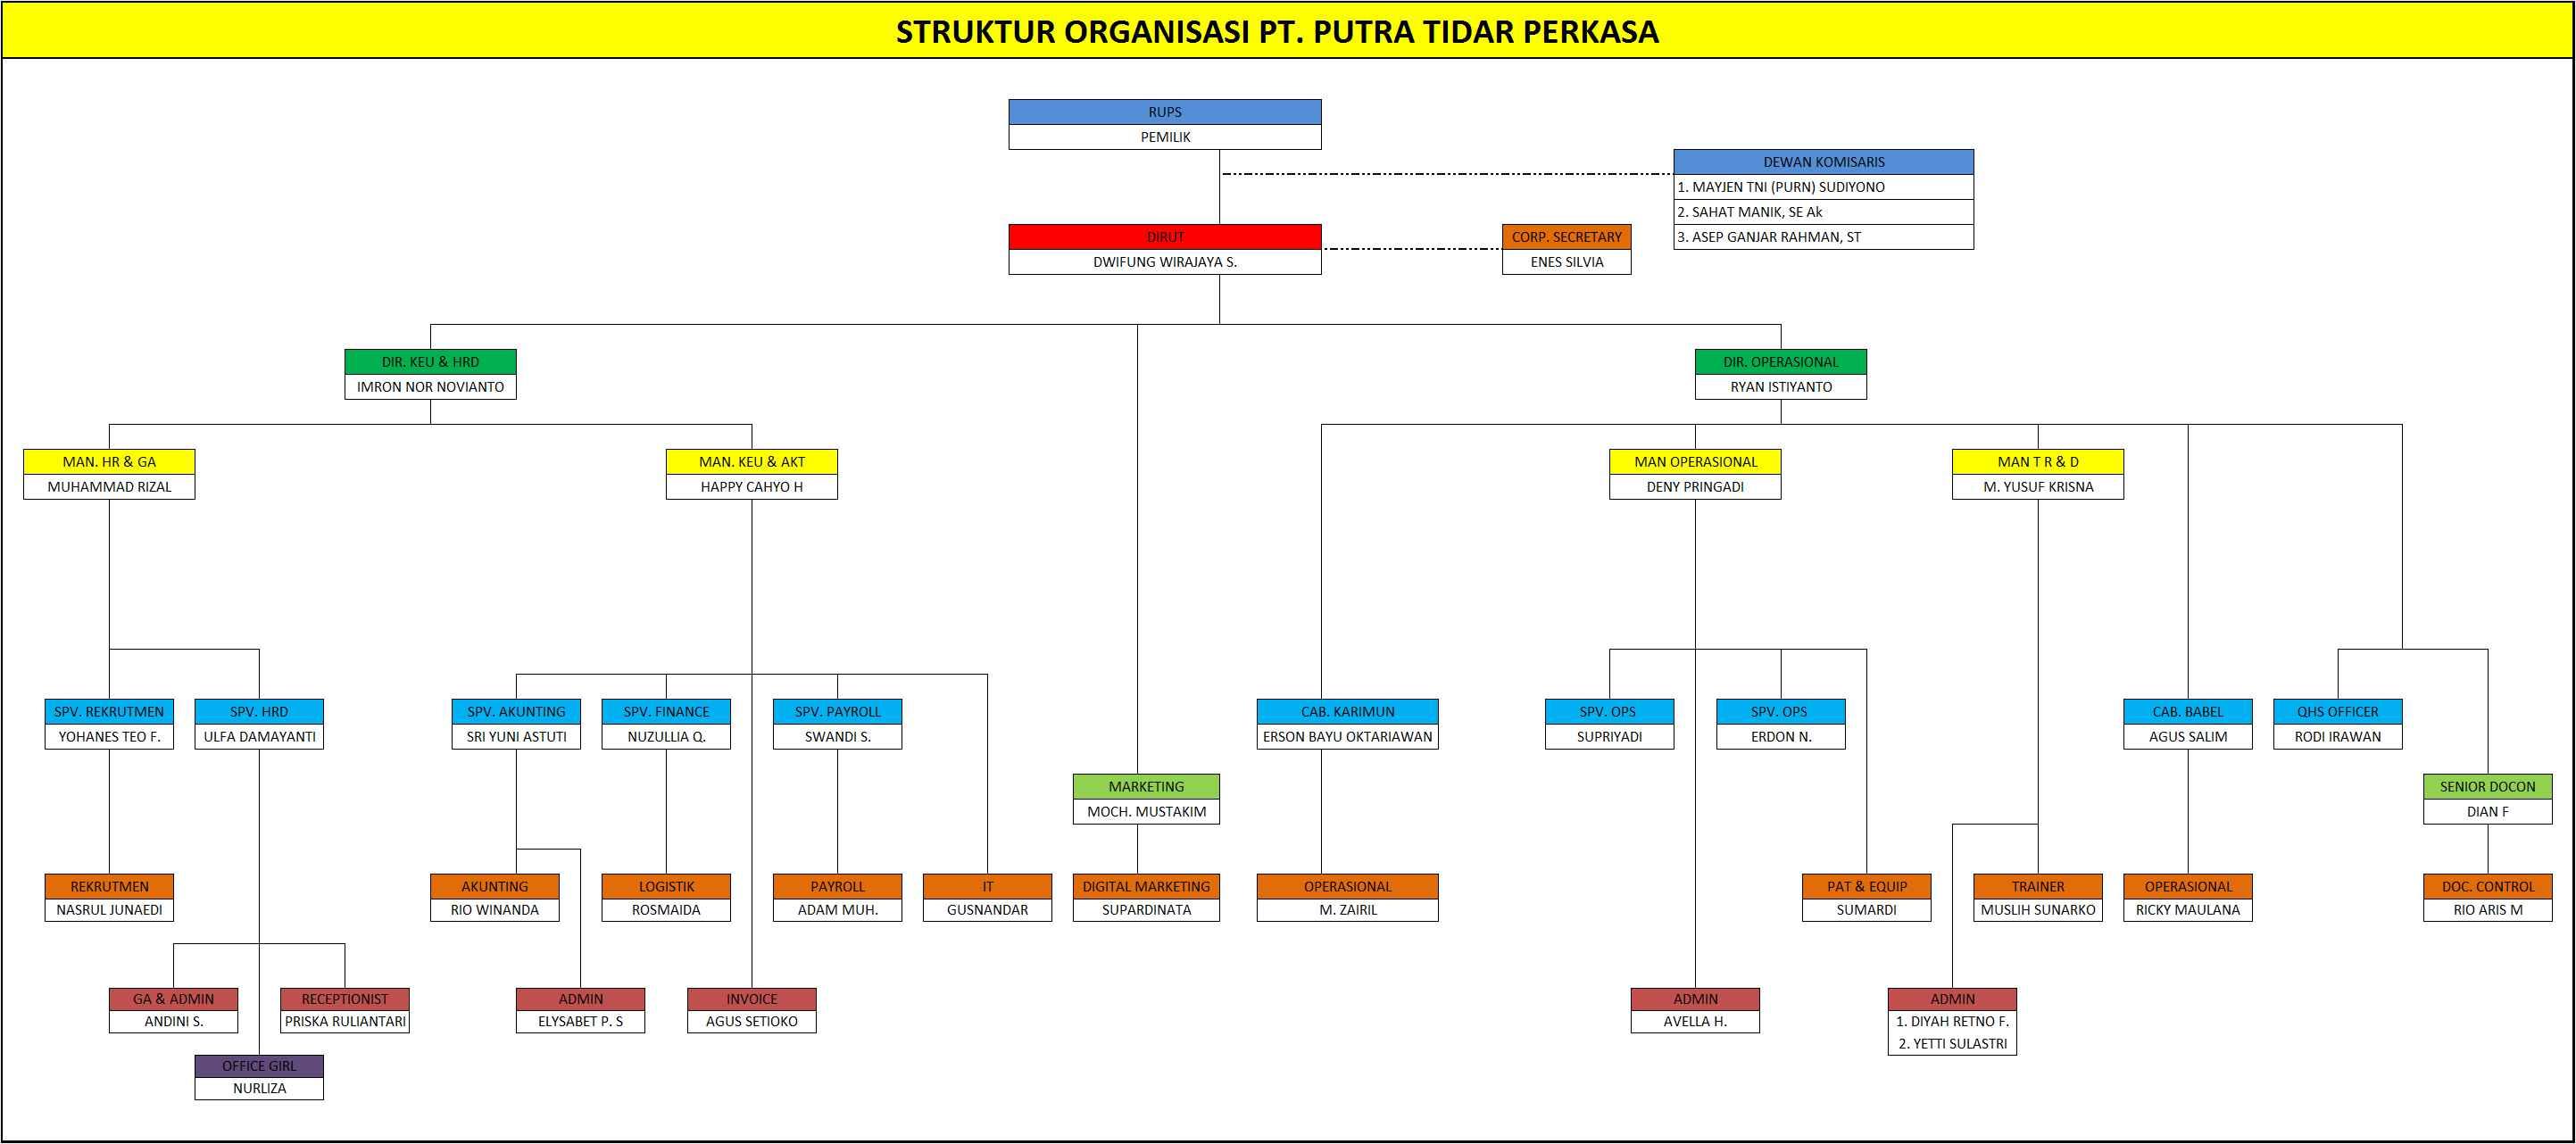 Struktur Organisasi PT. Putra Tidar Perkasa